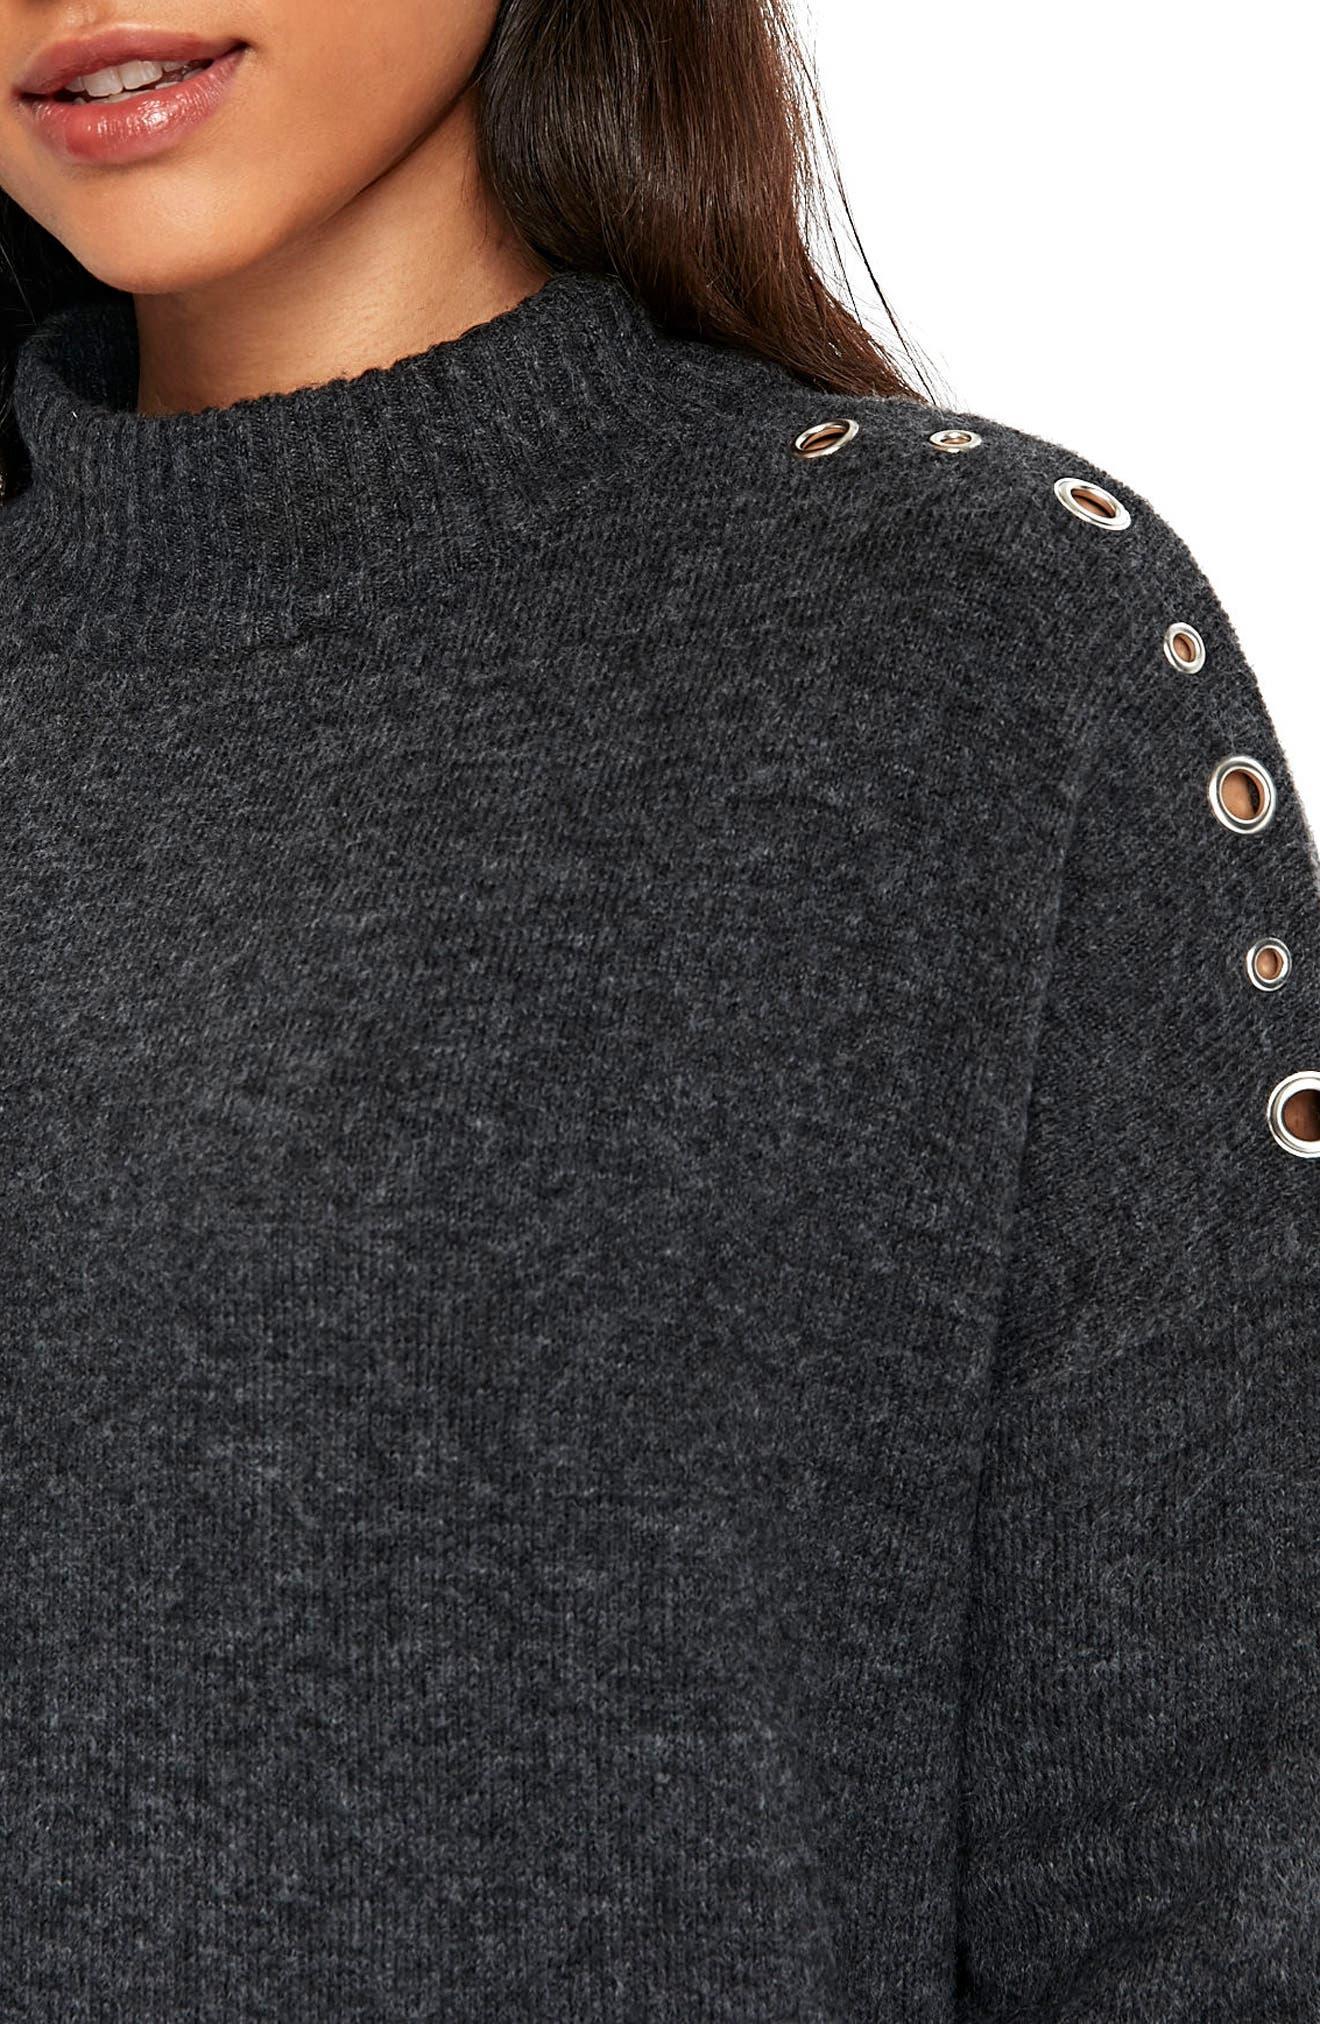 Eyelet Shoulder Knit Tunic,                             Alternate thumbnail 3, color,                             021